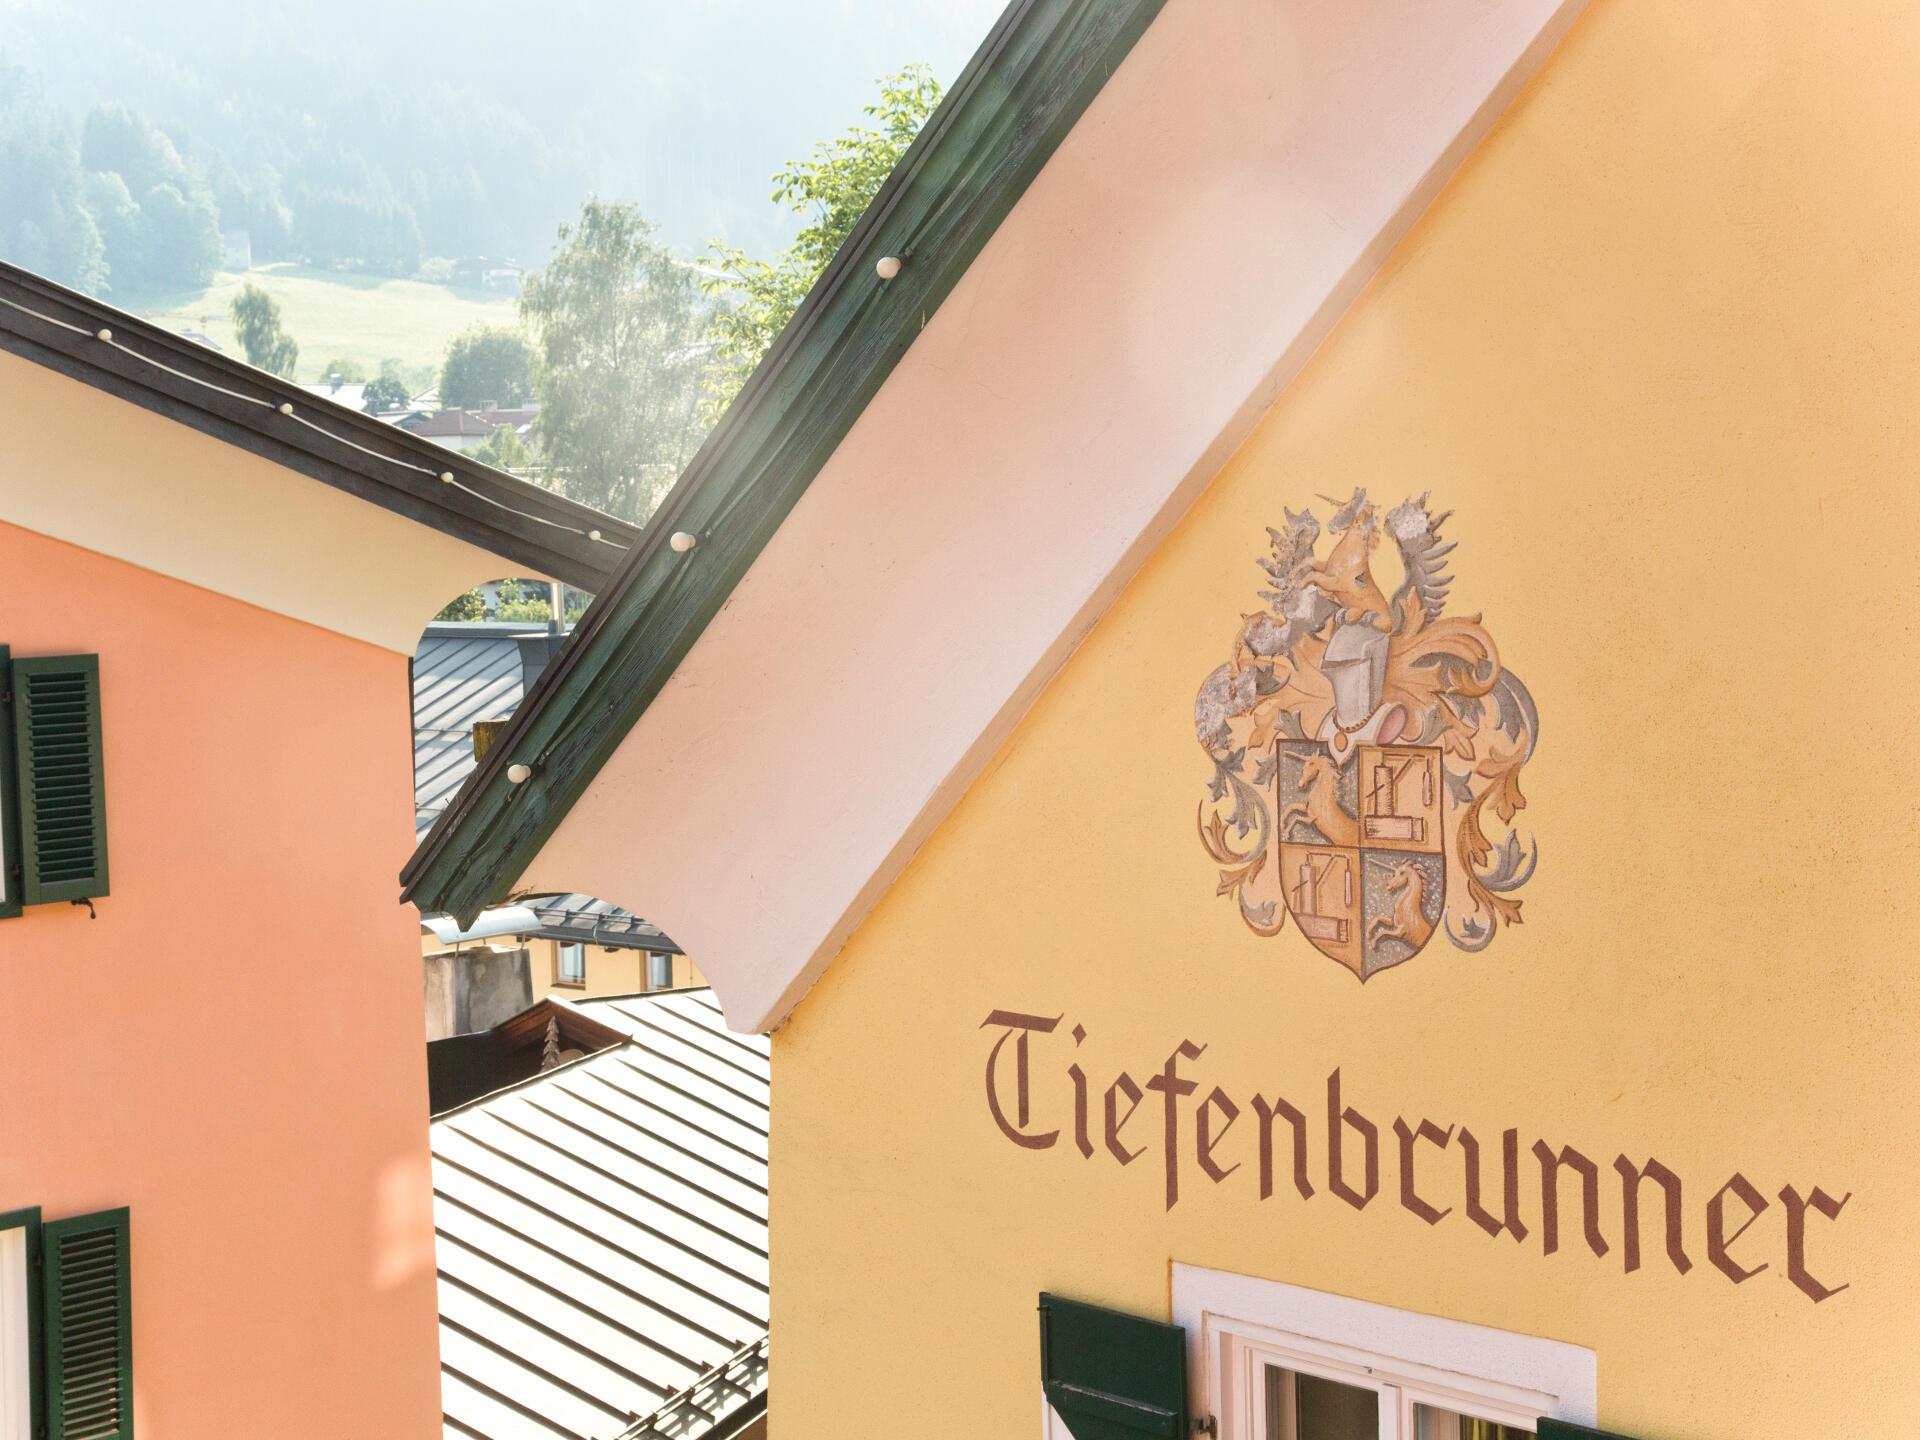 Tiefenbrunner Hotel in Kitzbühel, Austria